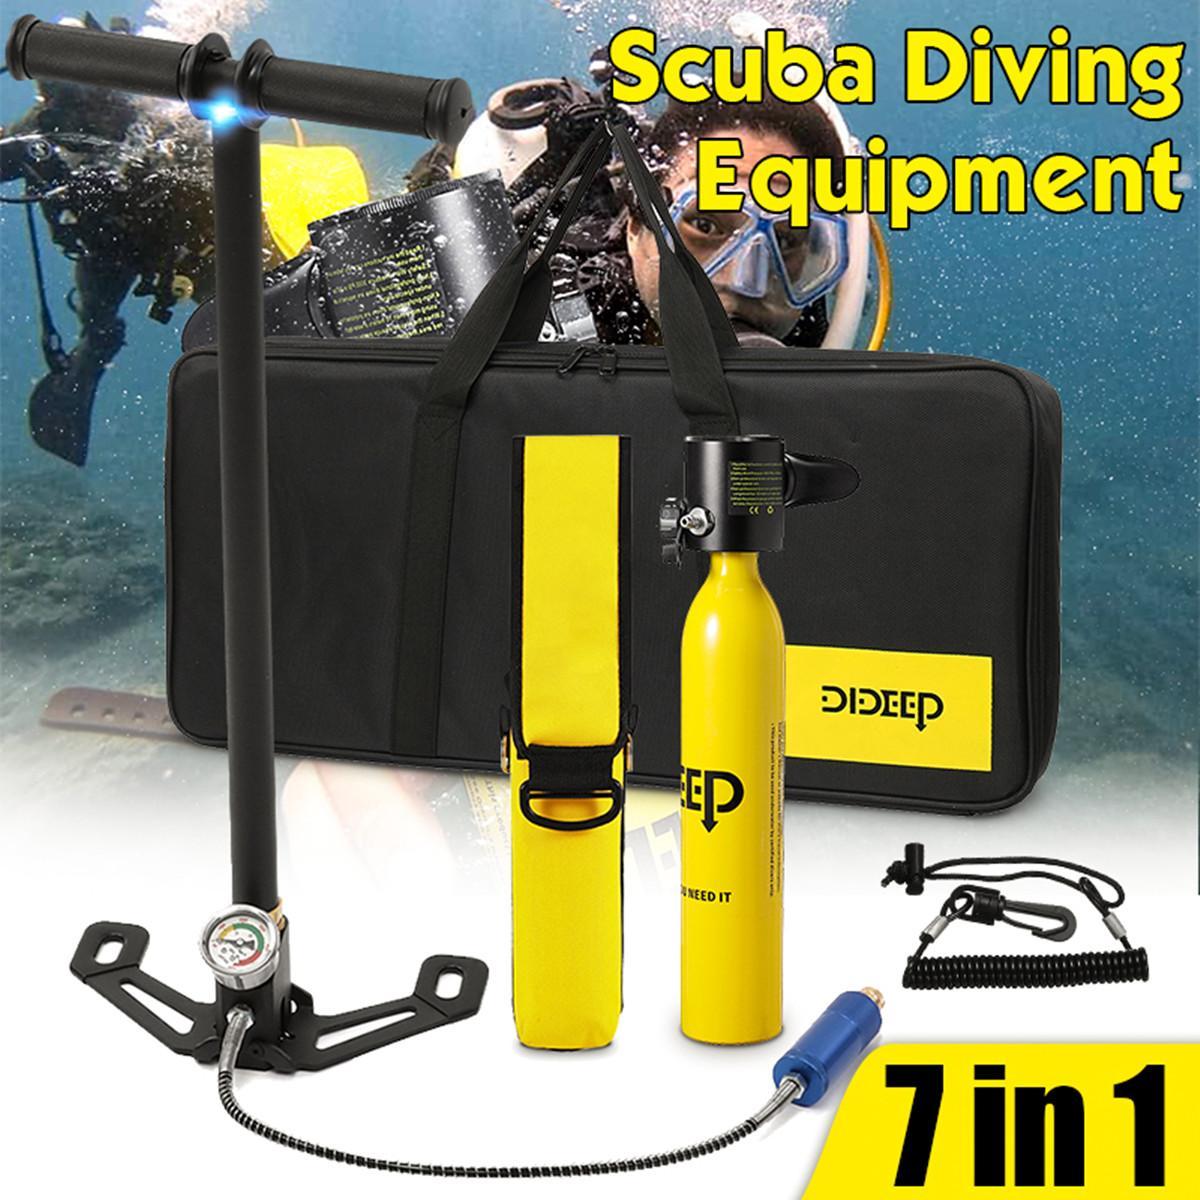 DIDEEP Diving System Mini Scuba Oxygen Cylinder Air Tank Scuba Reserve Air Tank Pump Snorkeling Gear Snorkeling Diving Equipment